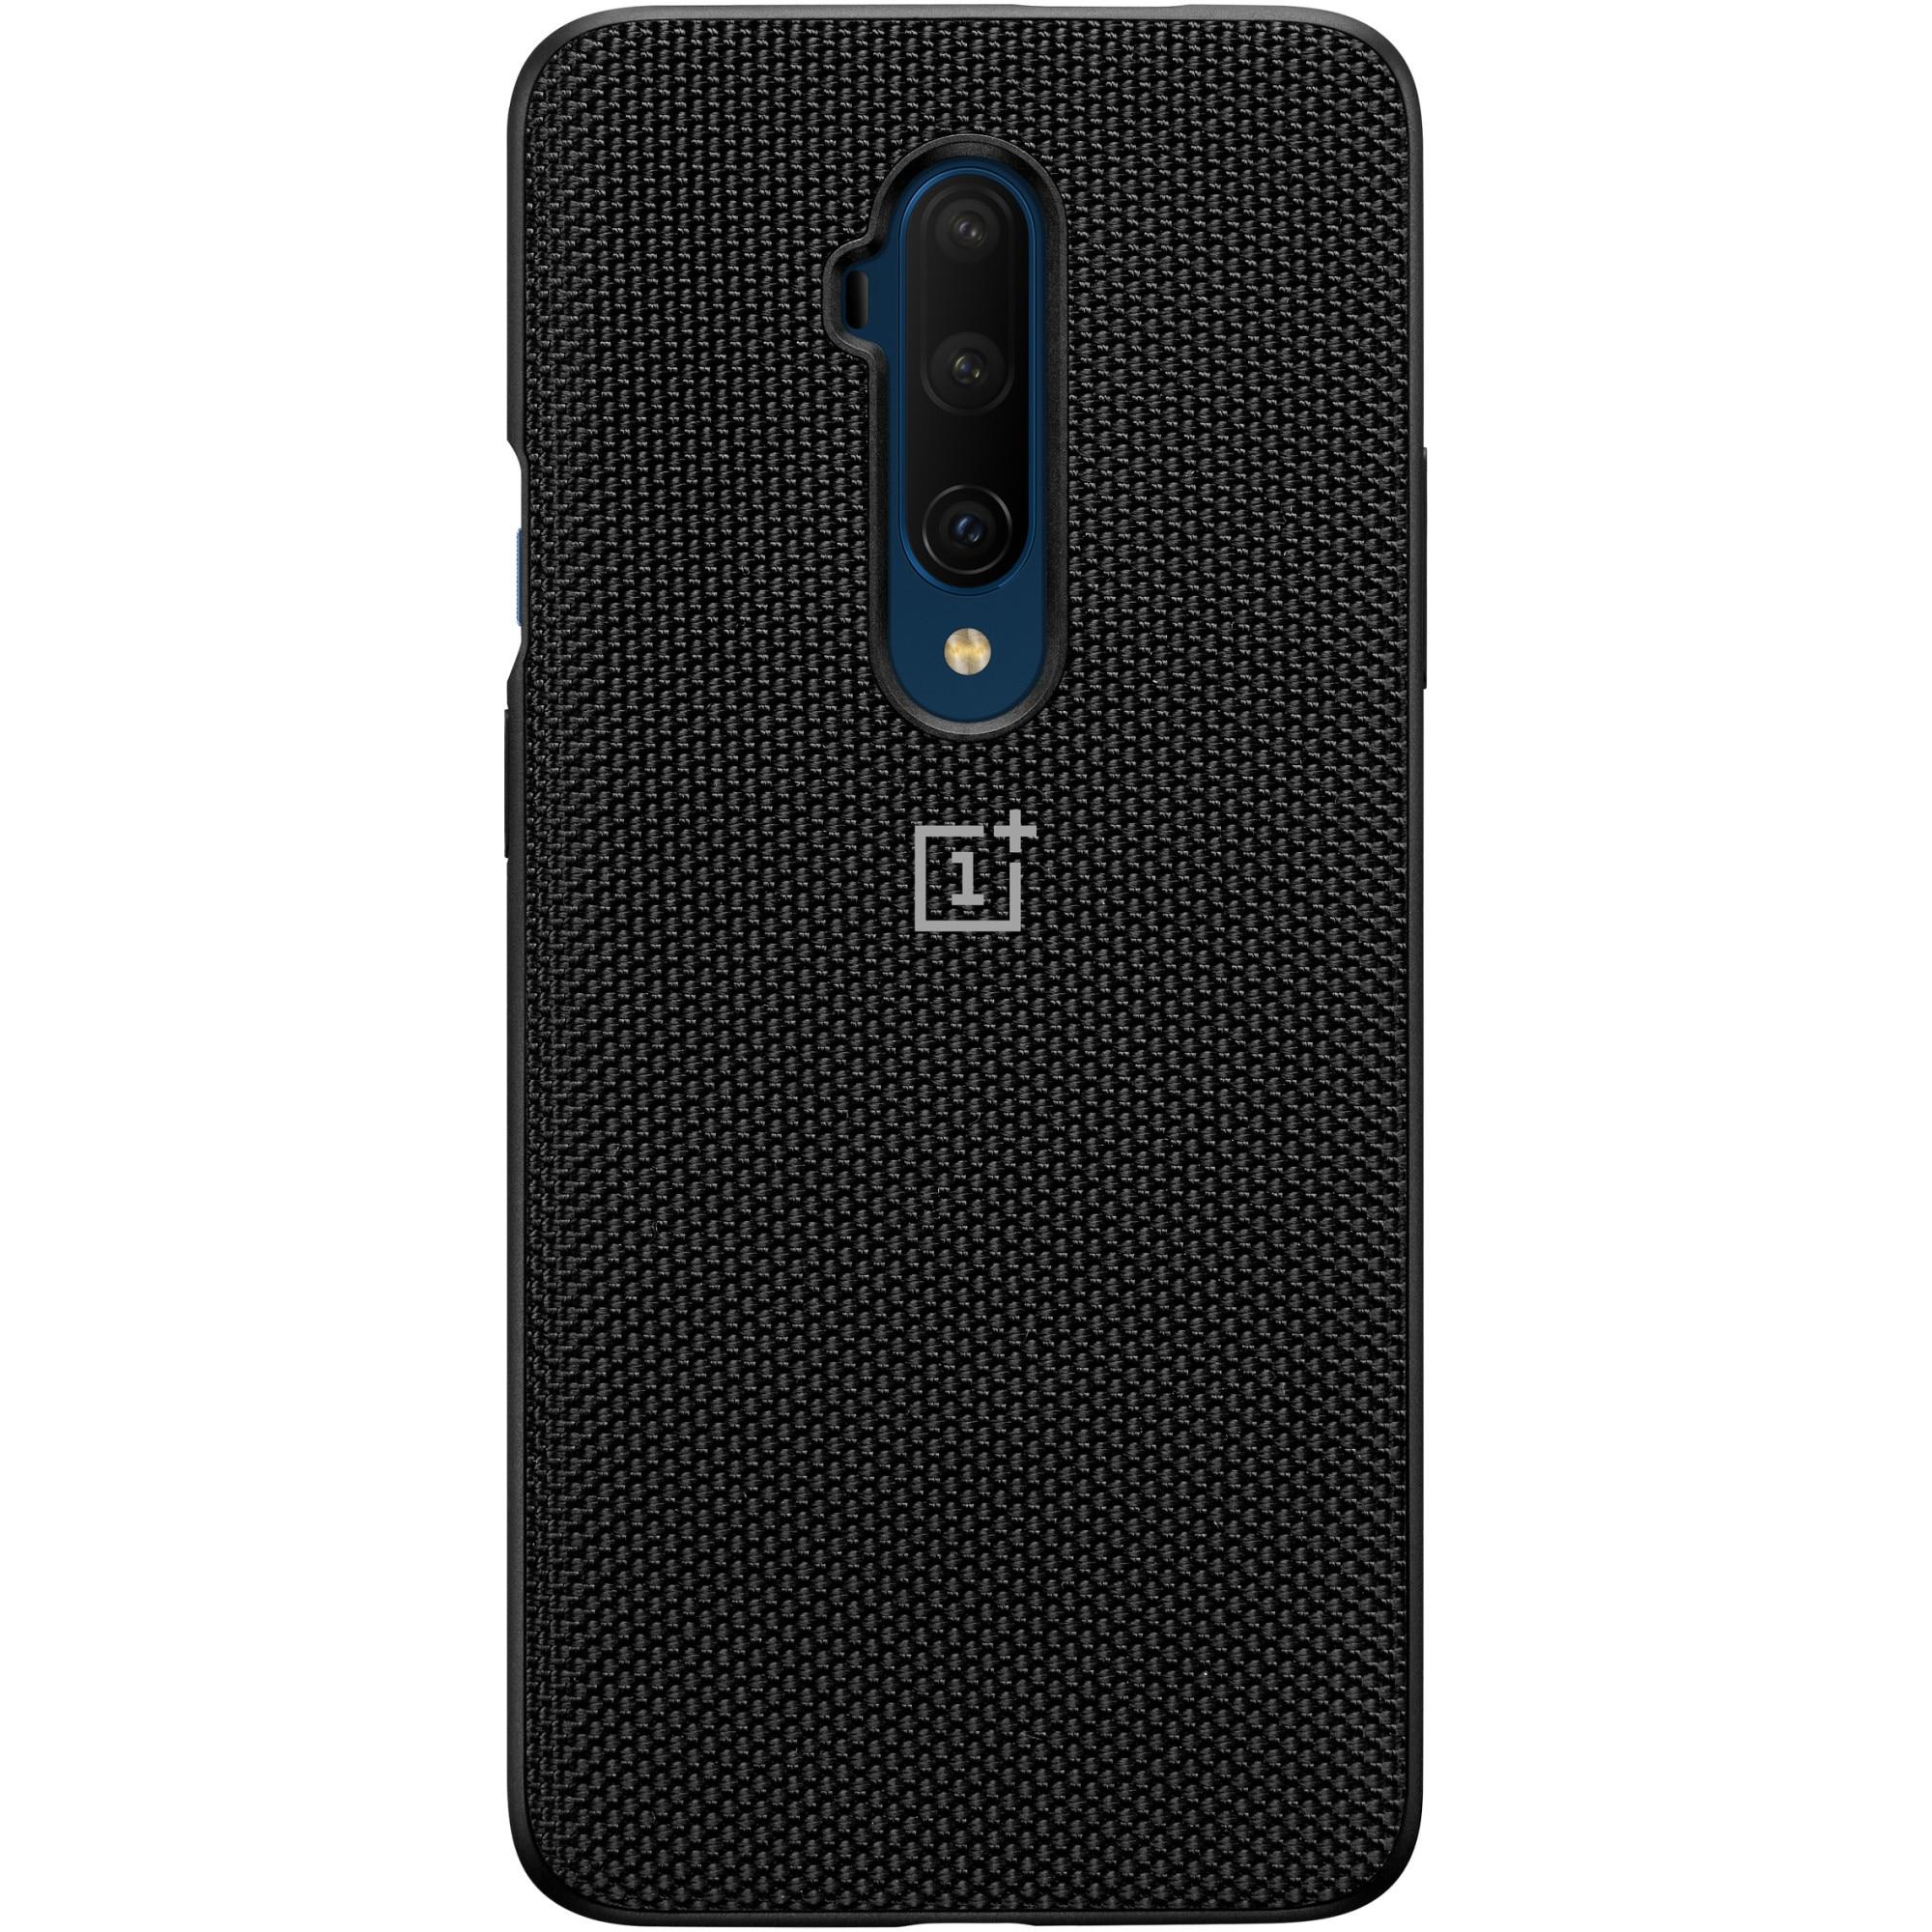 Fotografie Husa OnePlus Nylon Bumper Case pentru OnePlus 7T Pro, Black